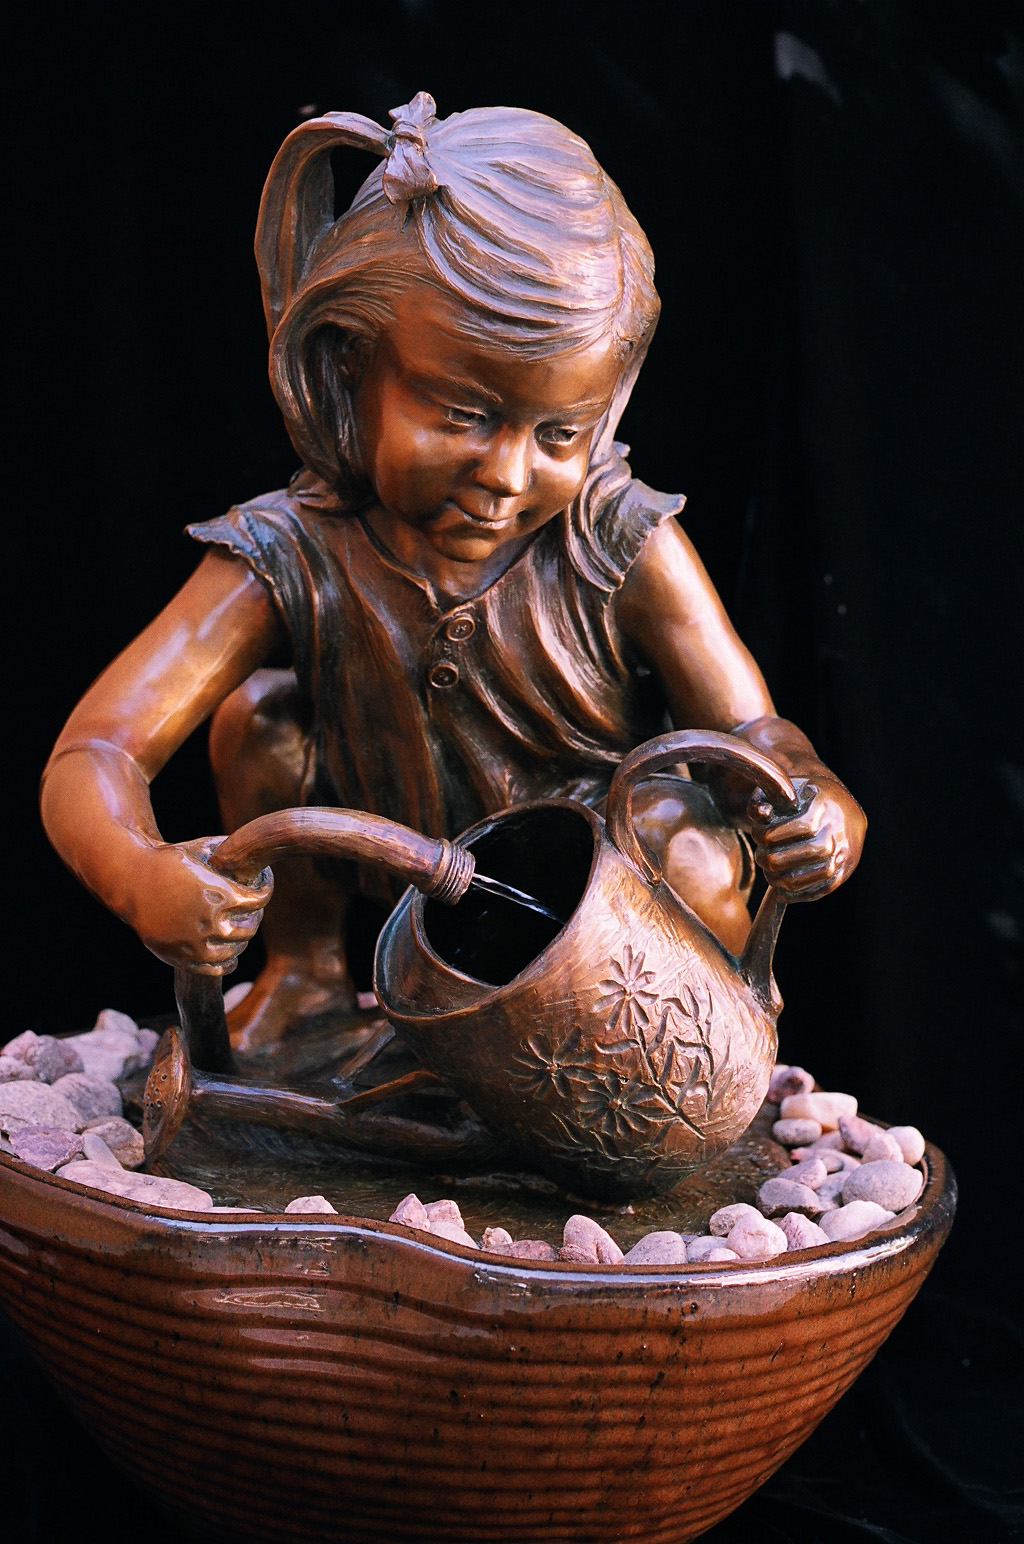 Little Ray of Sunshine bronze sculpture by Colorado artist Greg Todd